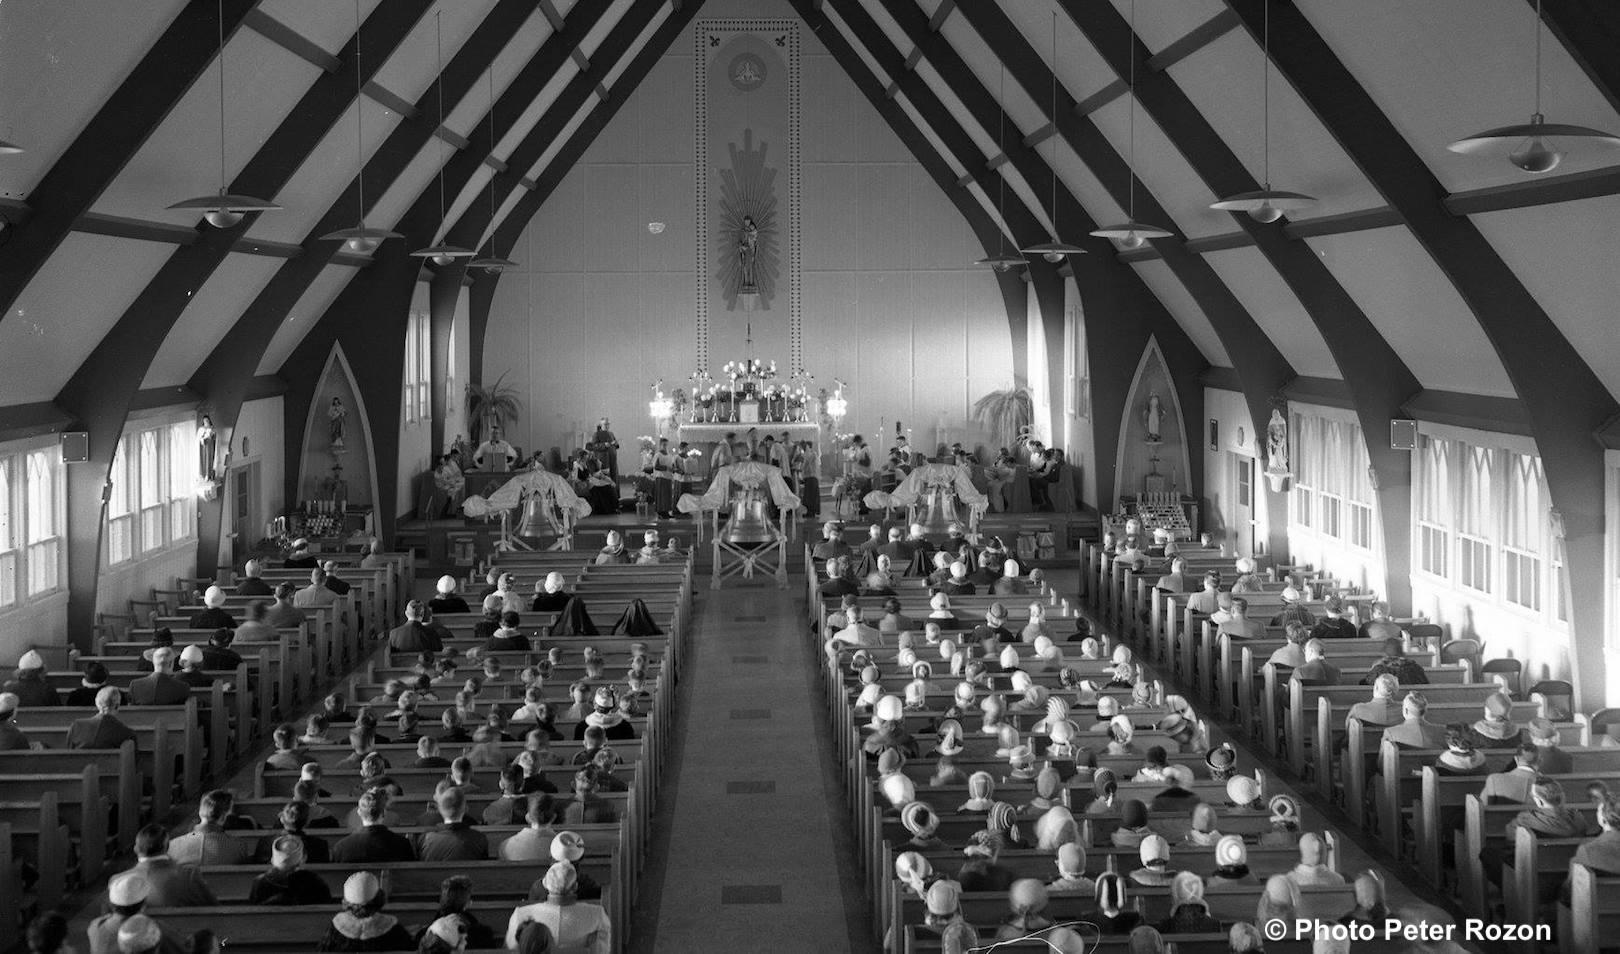 benediction des cloches eglise St-Joseph-Artisan a Valleyfield 1958 Copyright photo Peter_Rozon via MUSO